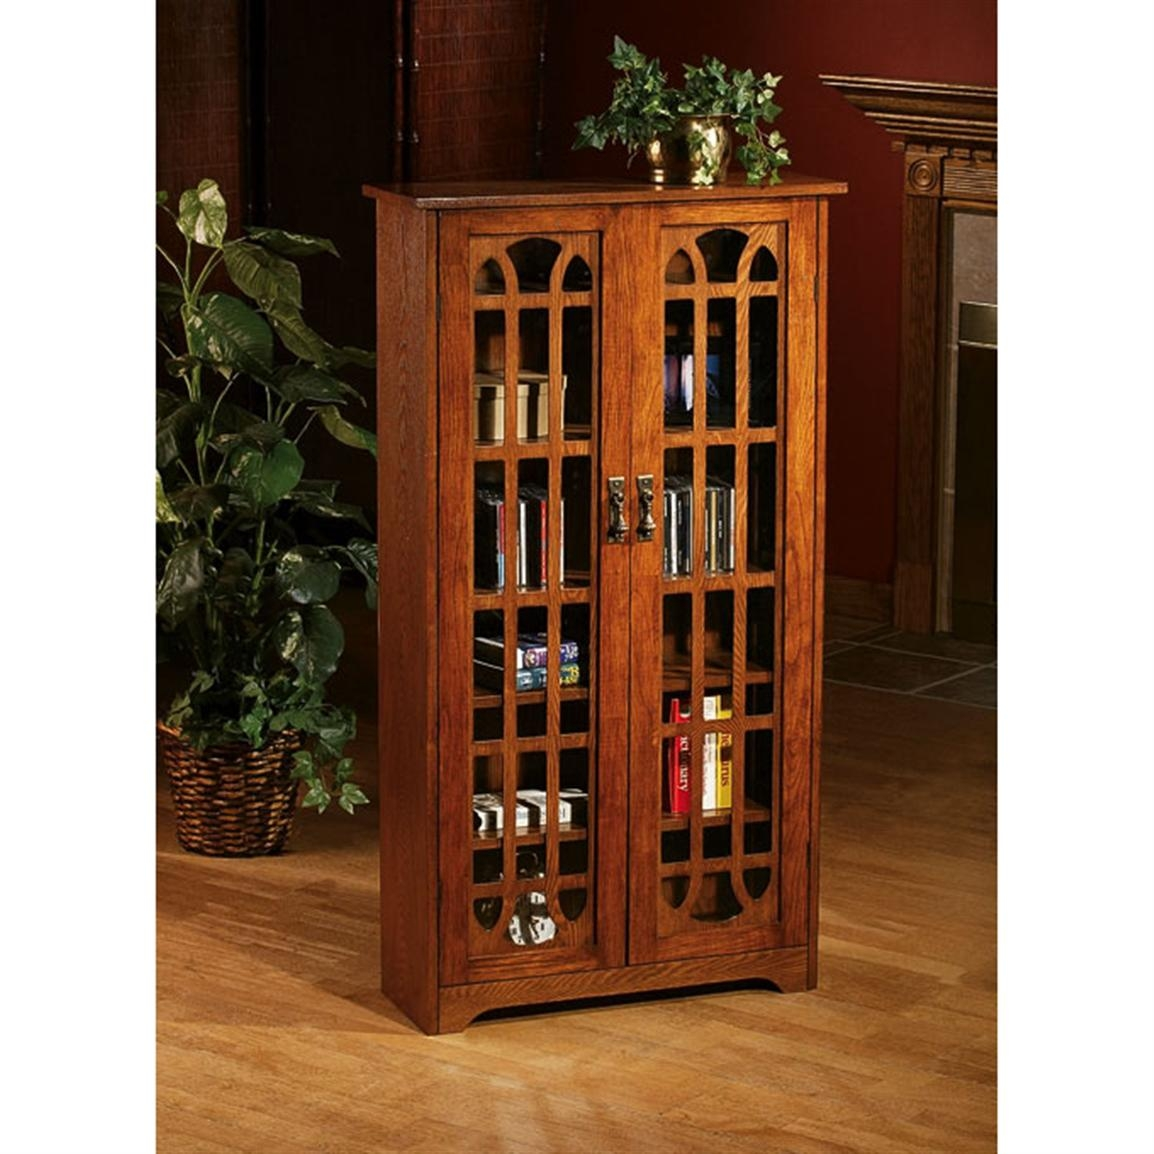 Southern Enterprises Window Pane Media Cabinet Bookcase   Oak